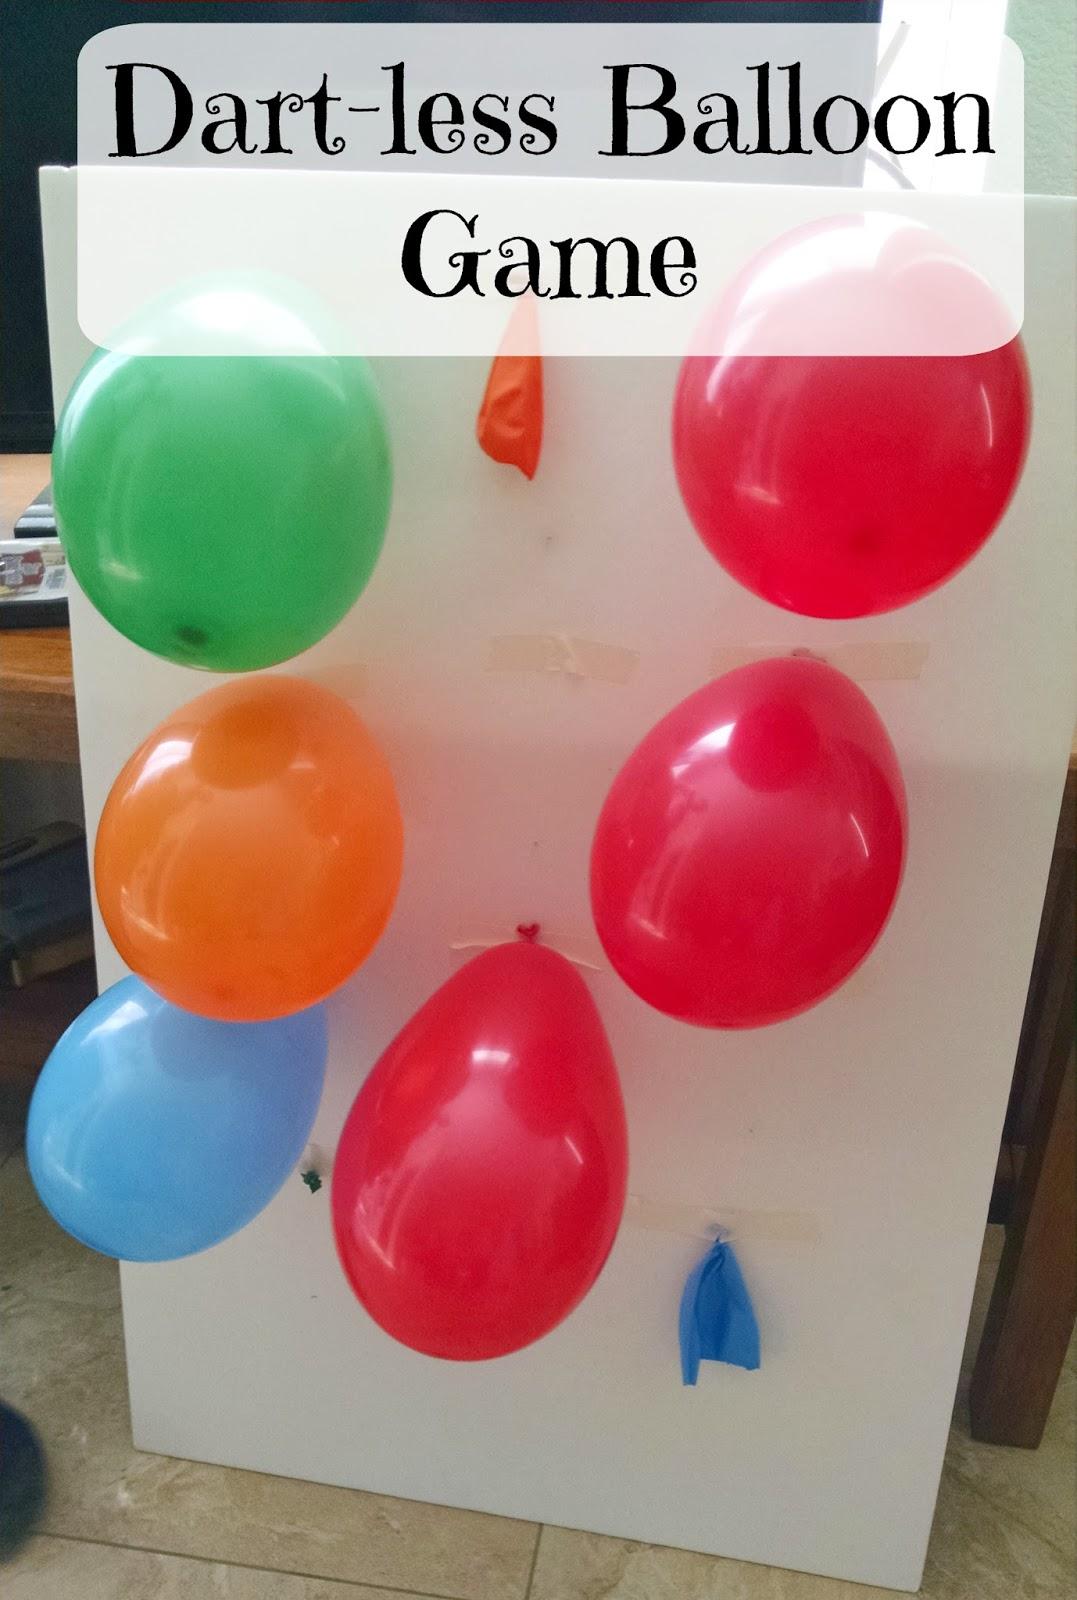 Through My Front Window Dartless Balloon Game